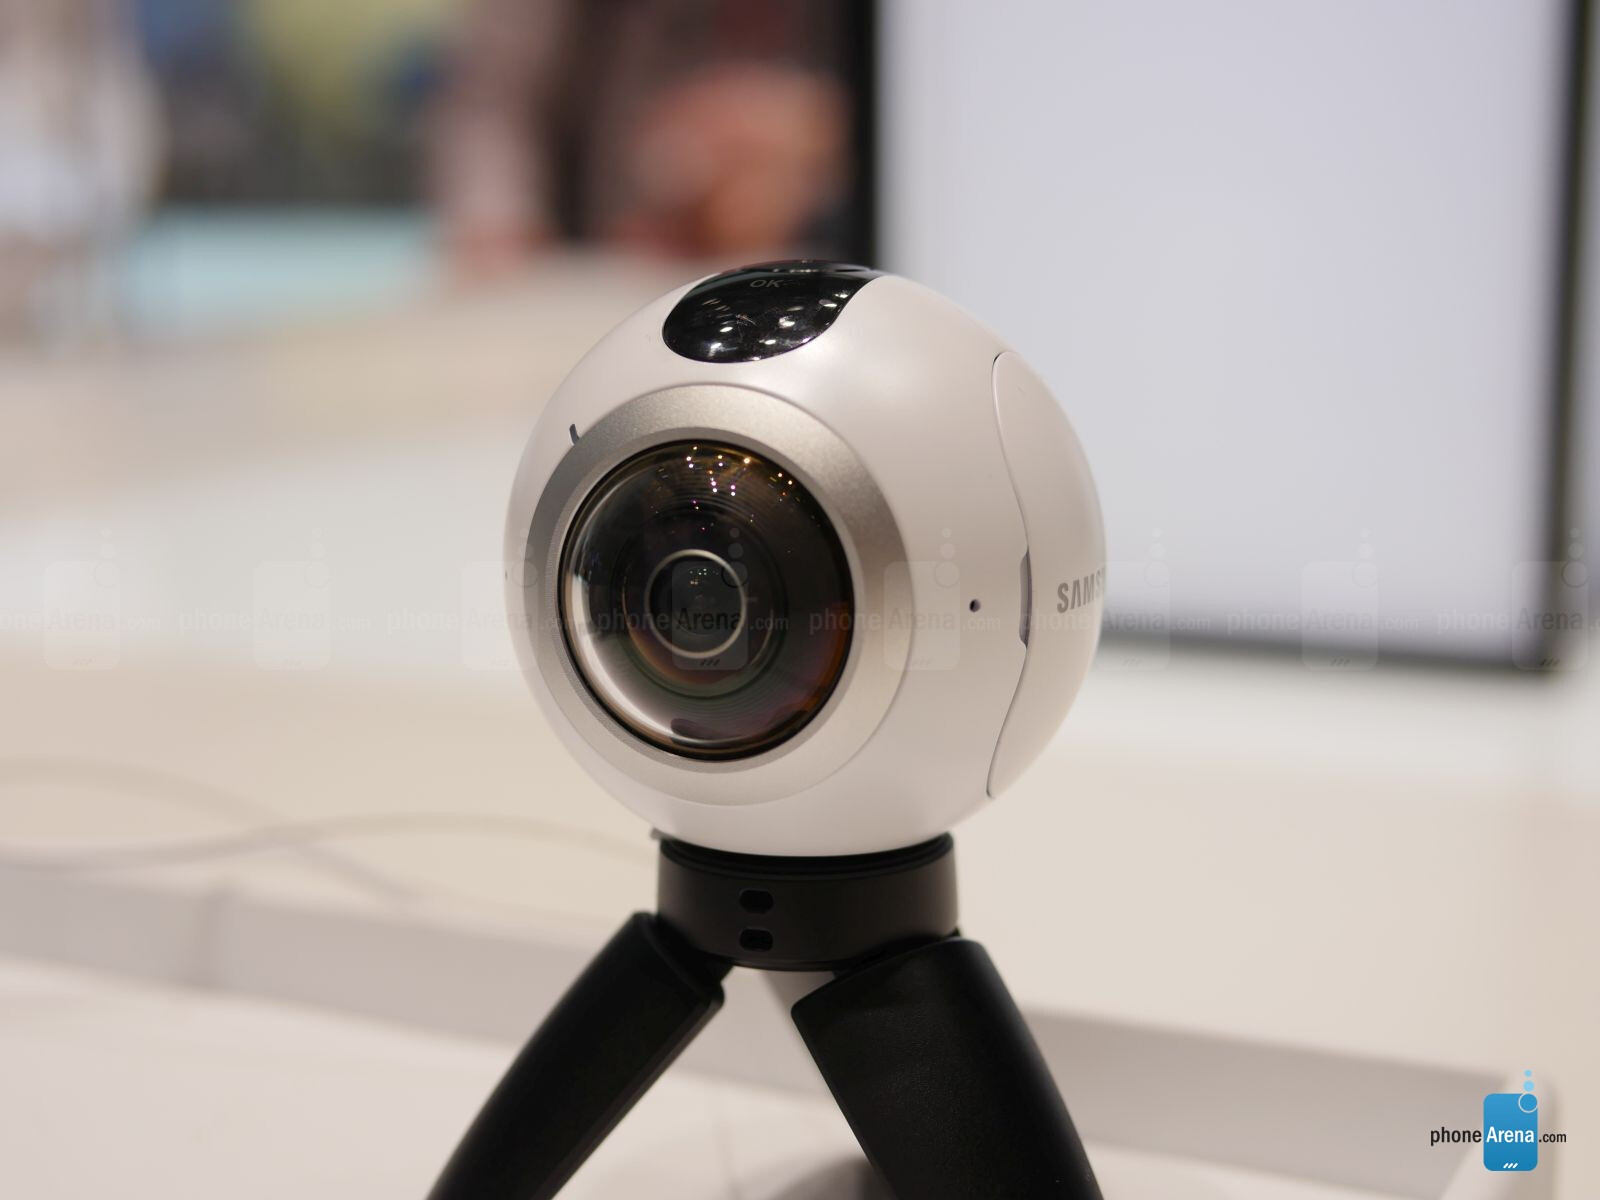 1. Samsung Gear 360